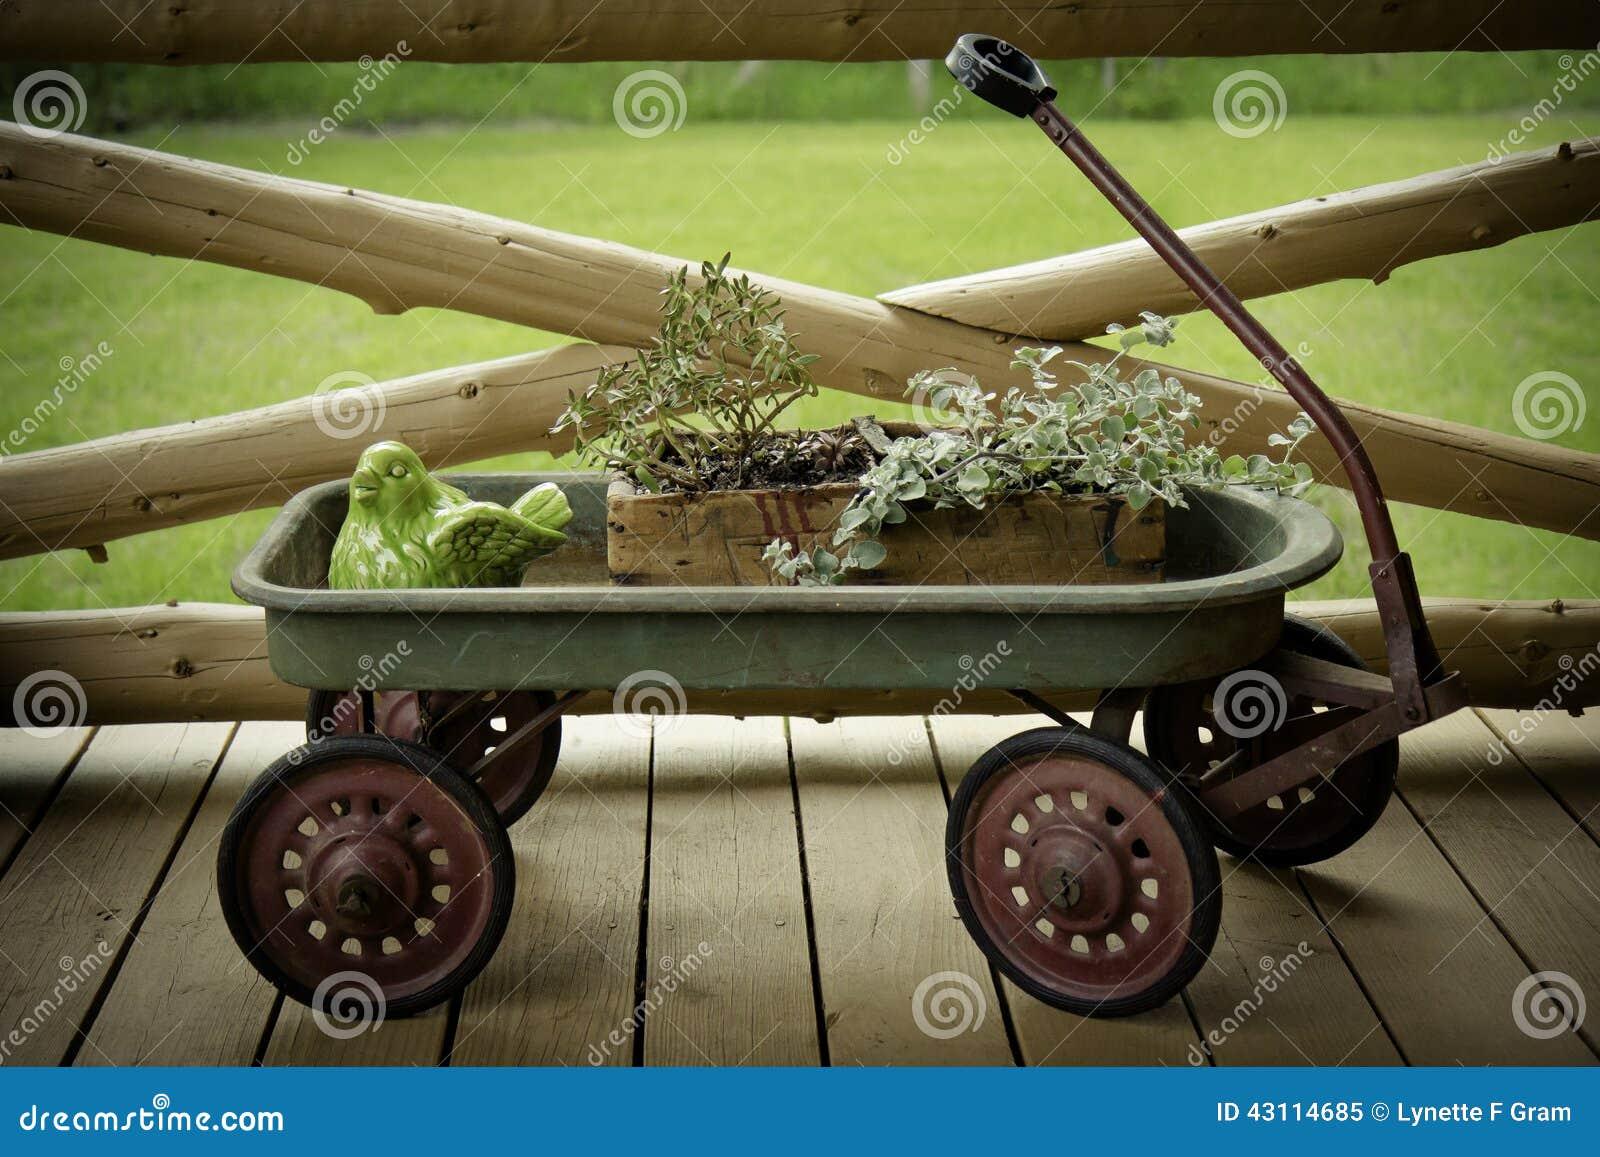 Antique Wagon Flower Display Stock Image - Image of bird, porch ...